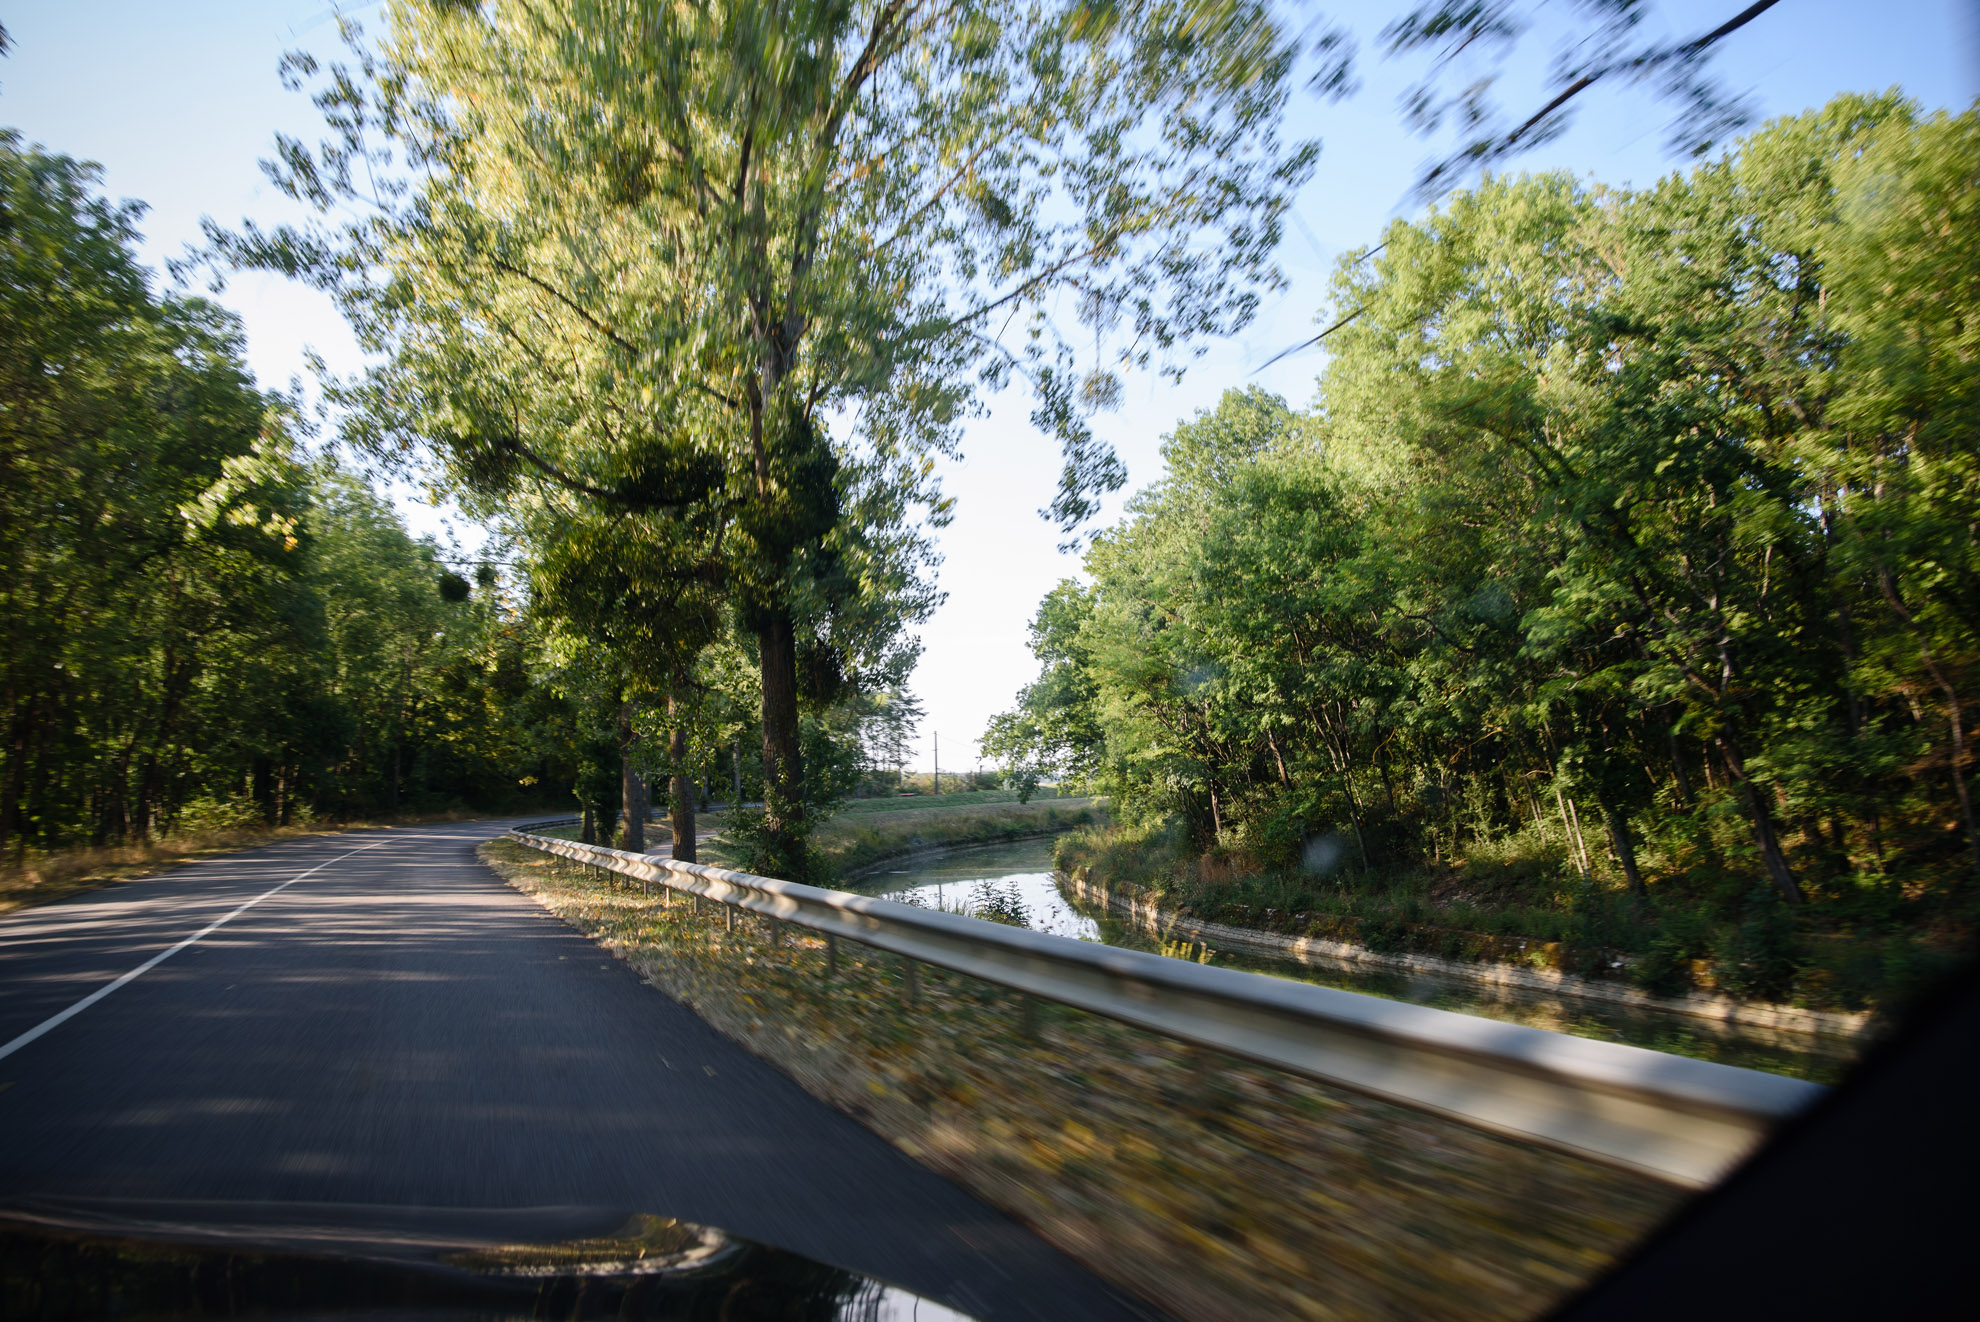 Droga w Burgundii